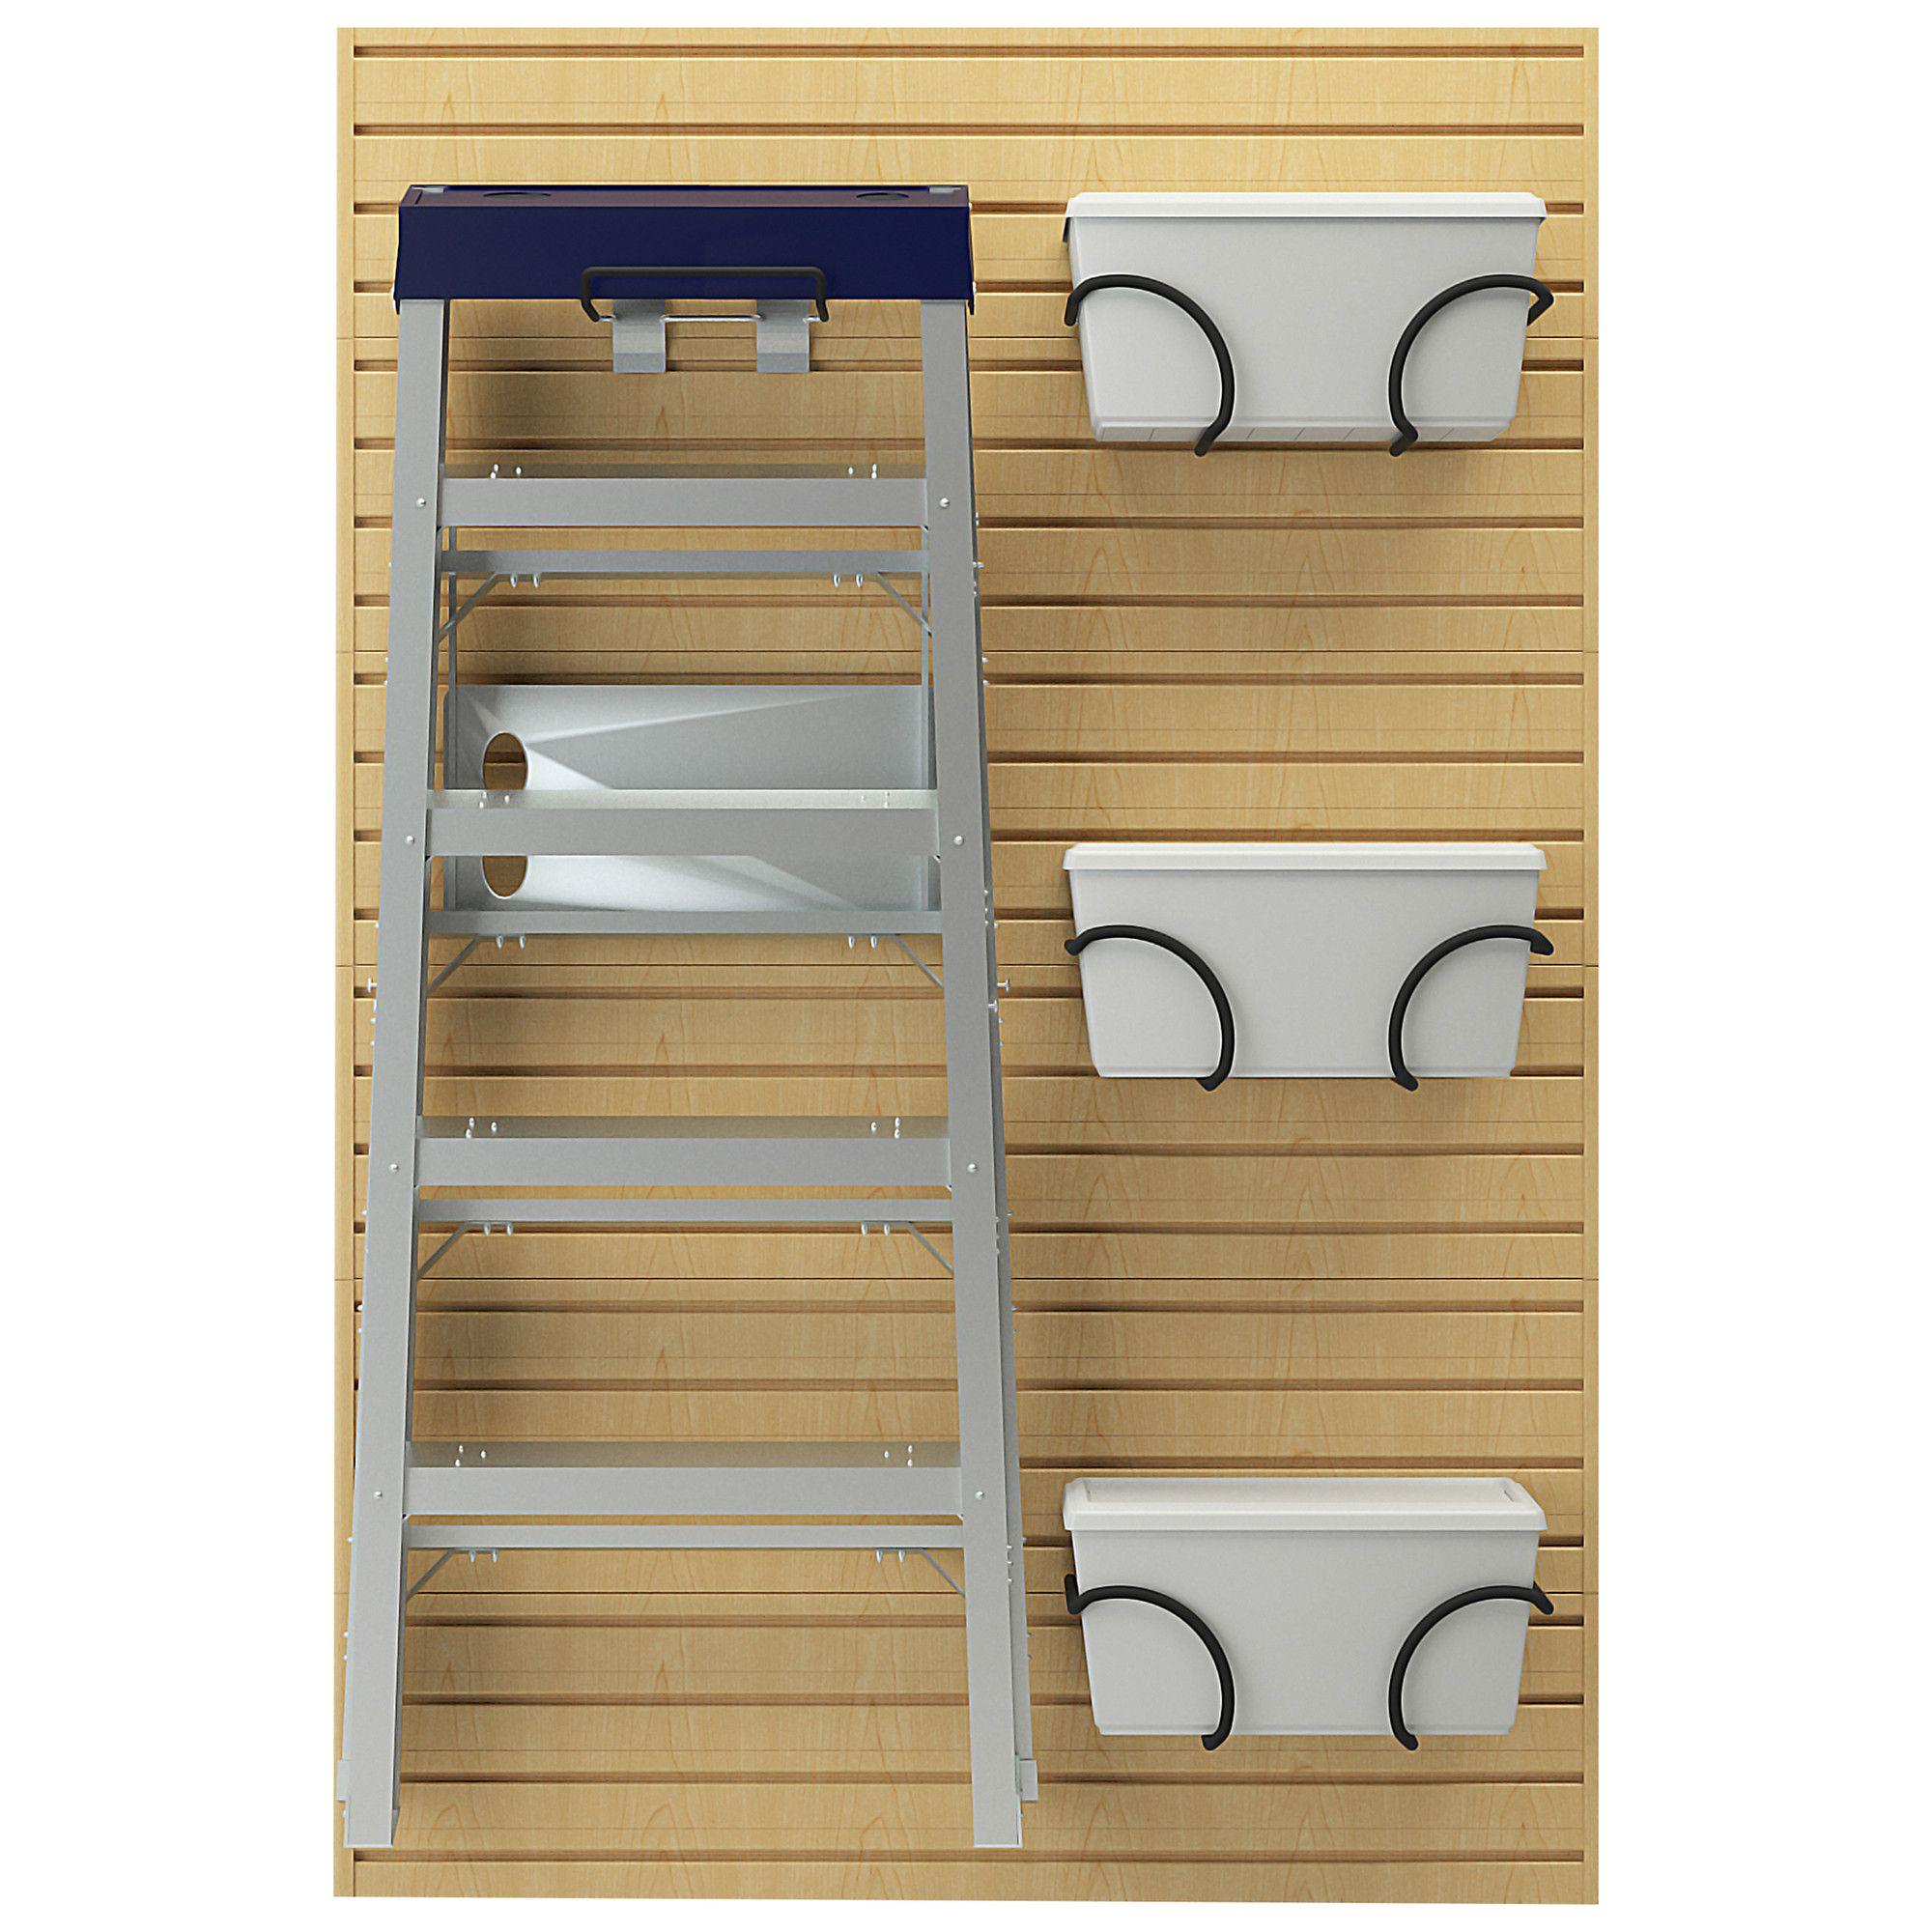 5-Piece Ladder Hook & Bin Bracket Set